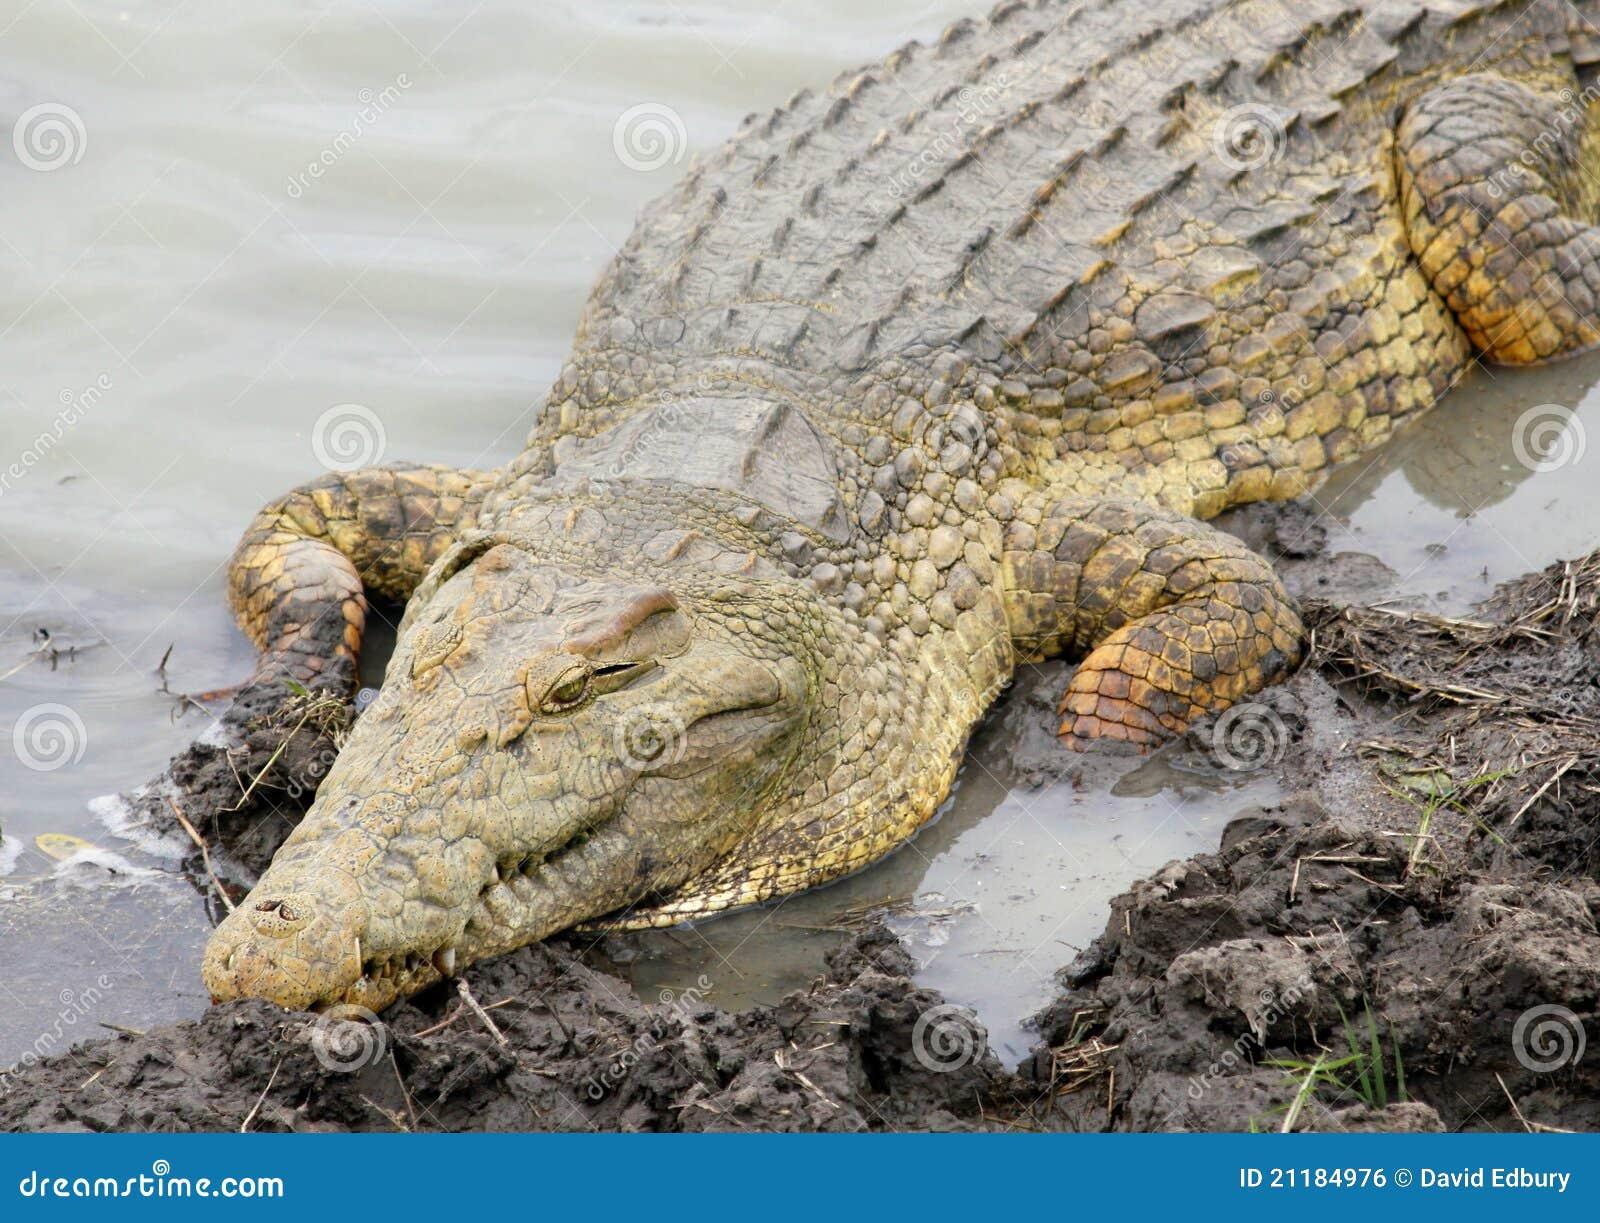 Nile Crocodile, Mikumi National Park, Tanzania